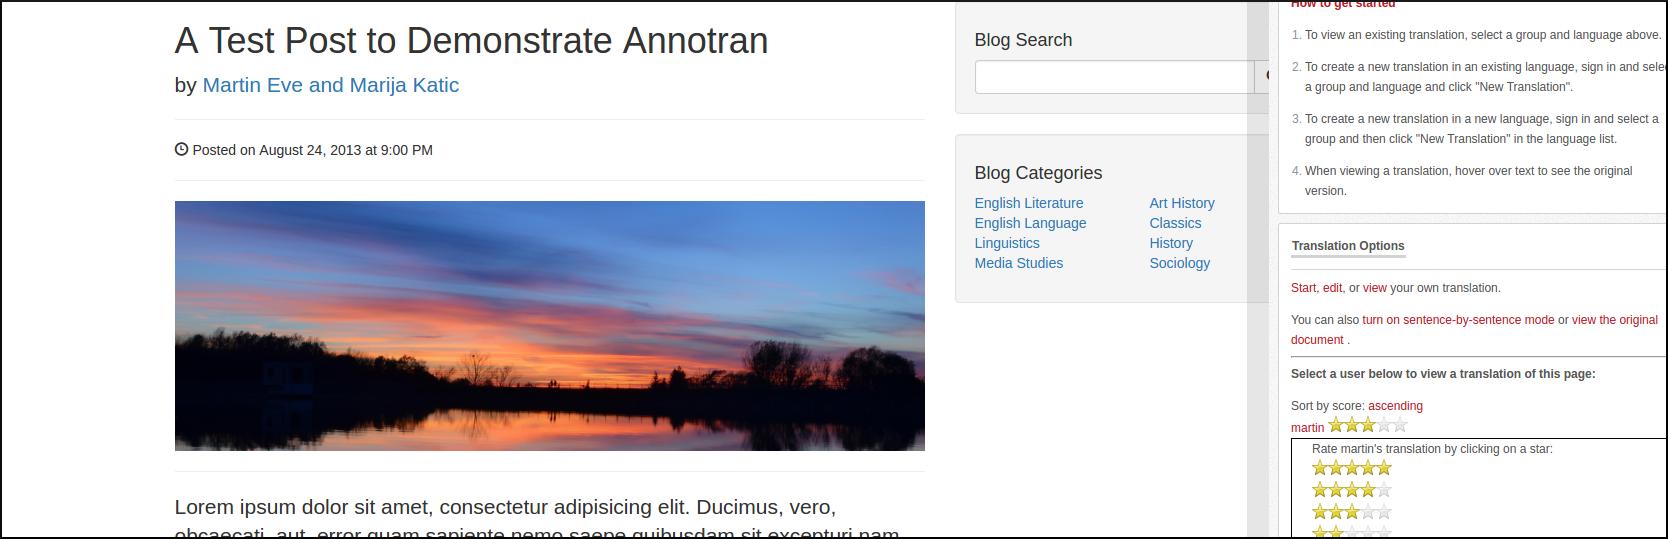 Annotran